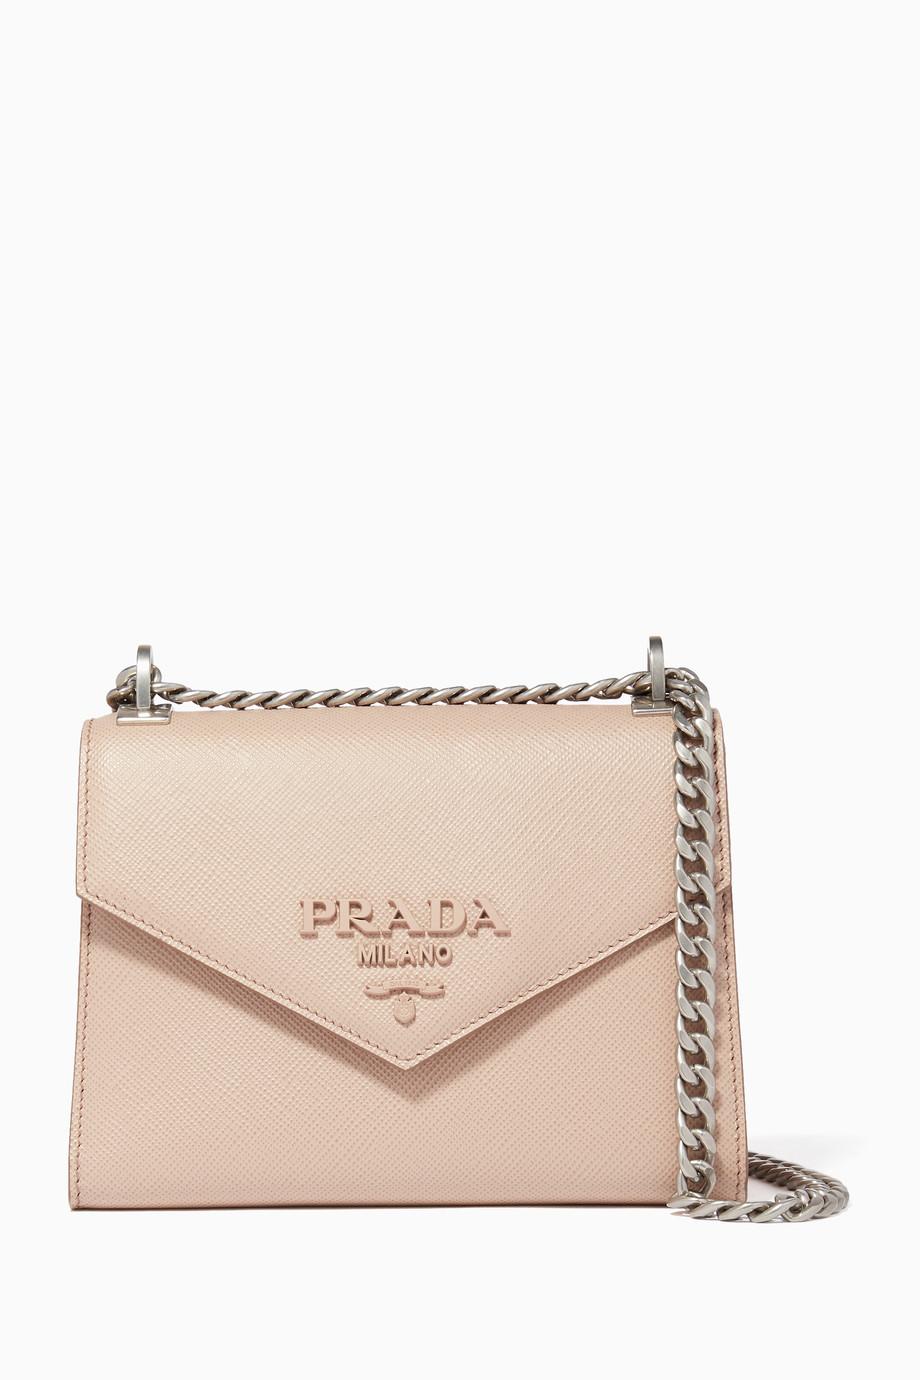 9b7c52836ad3 Shop Prada Pink Light-Pink Prada Monochrome Saffiano Leather ...